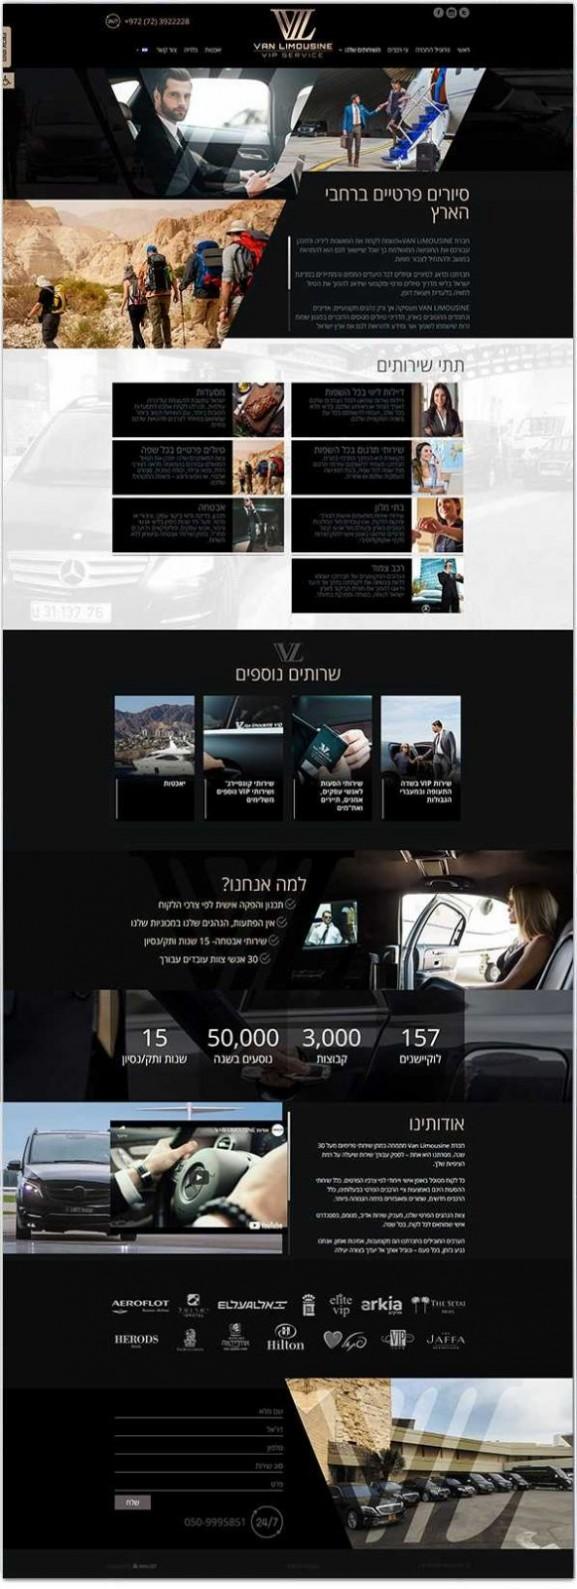 VAN LIMOUSINE, פיתוח אתר